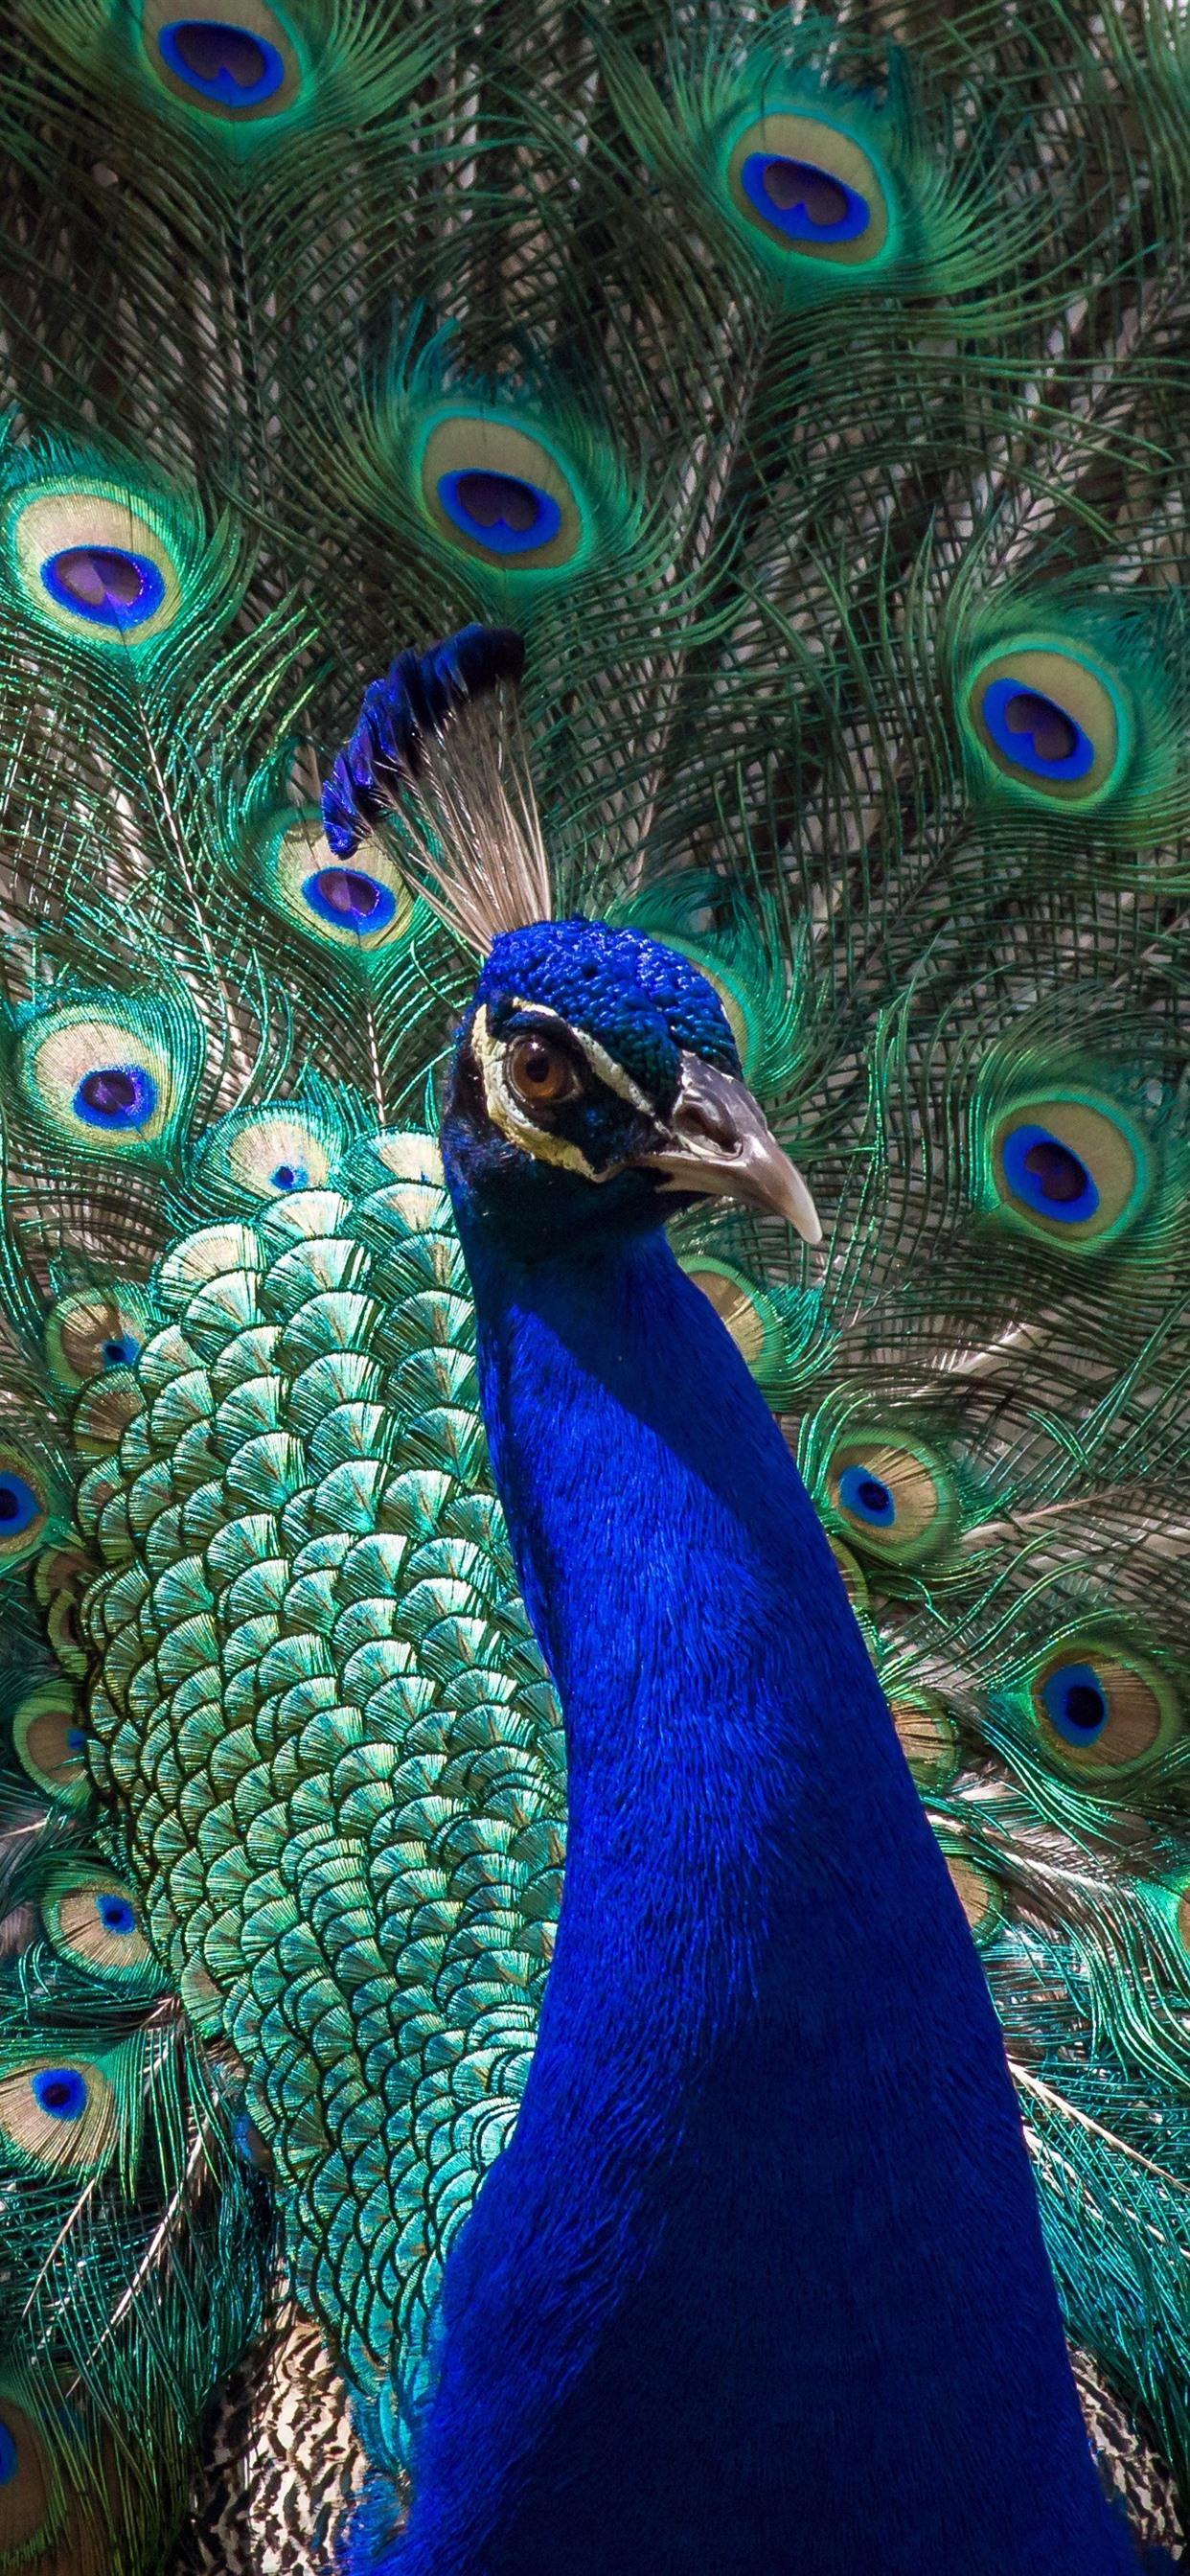 Peacock Open Tail Beautiful Feathers Bird 1242x2688 Iphone